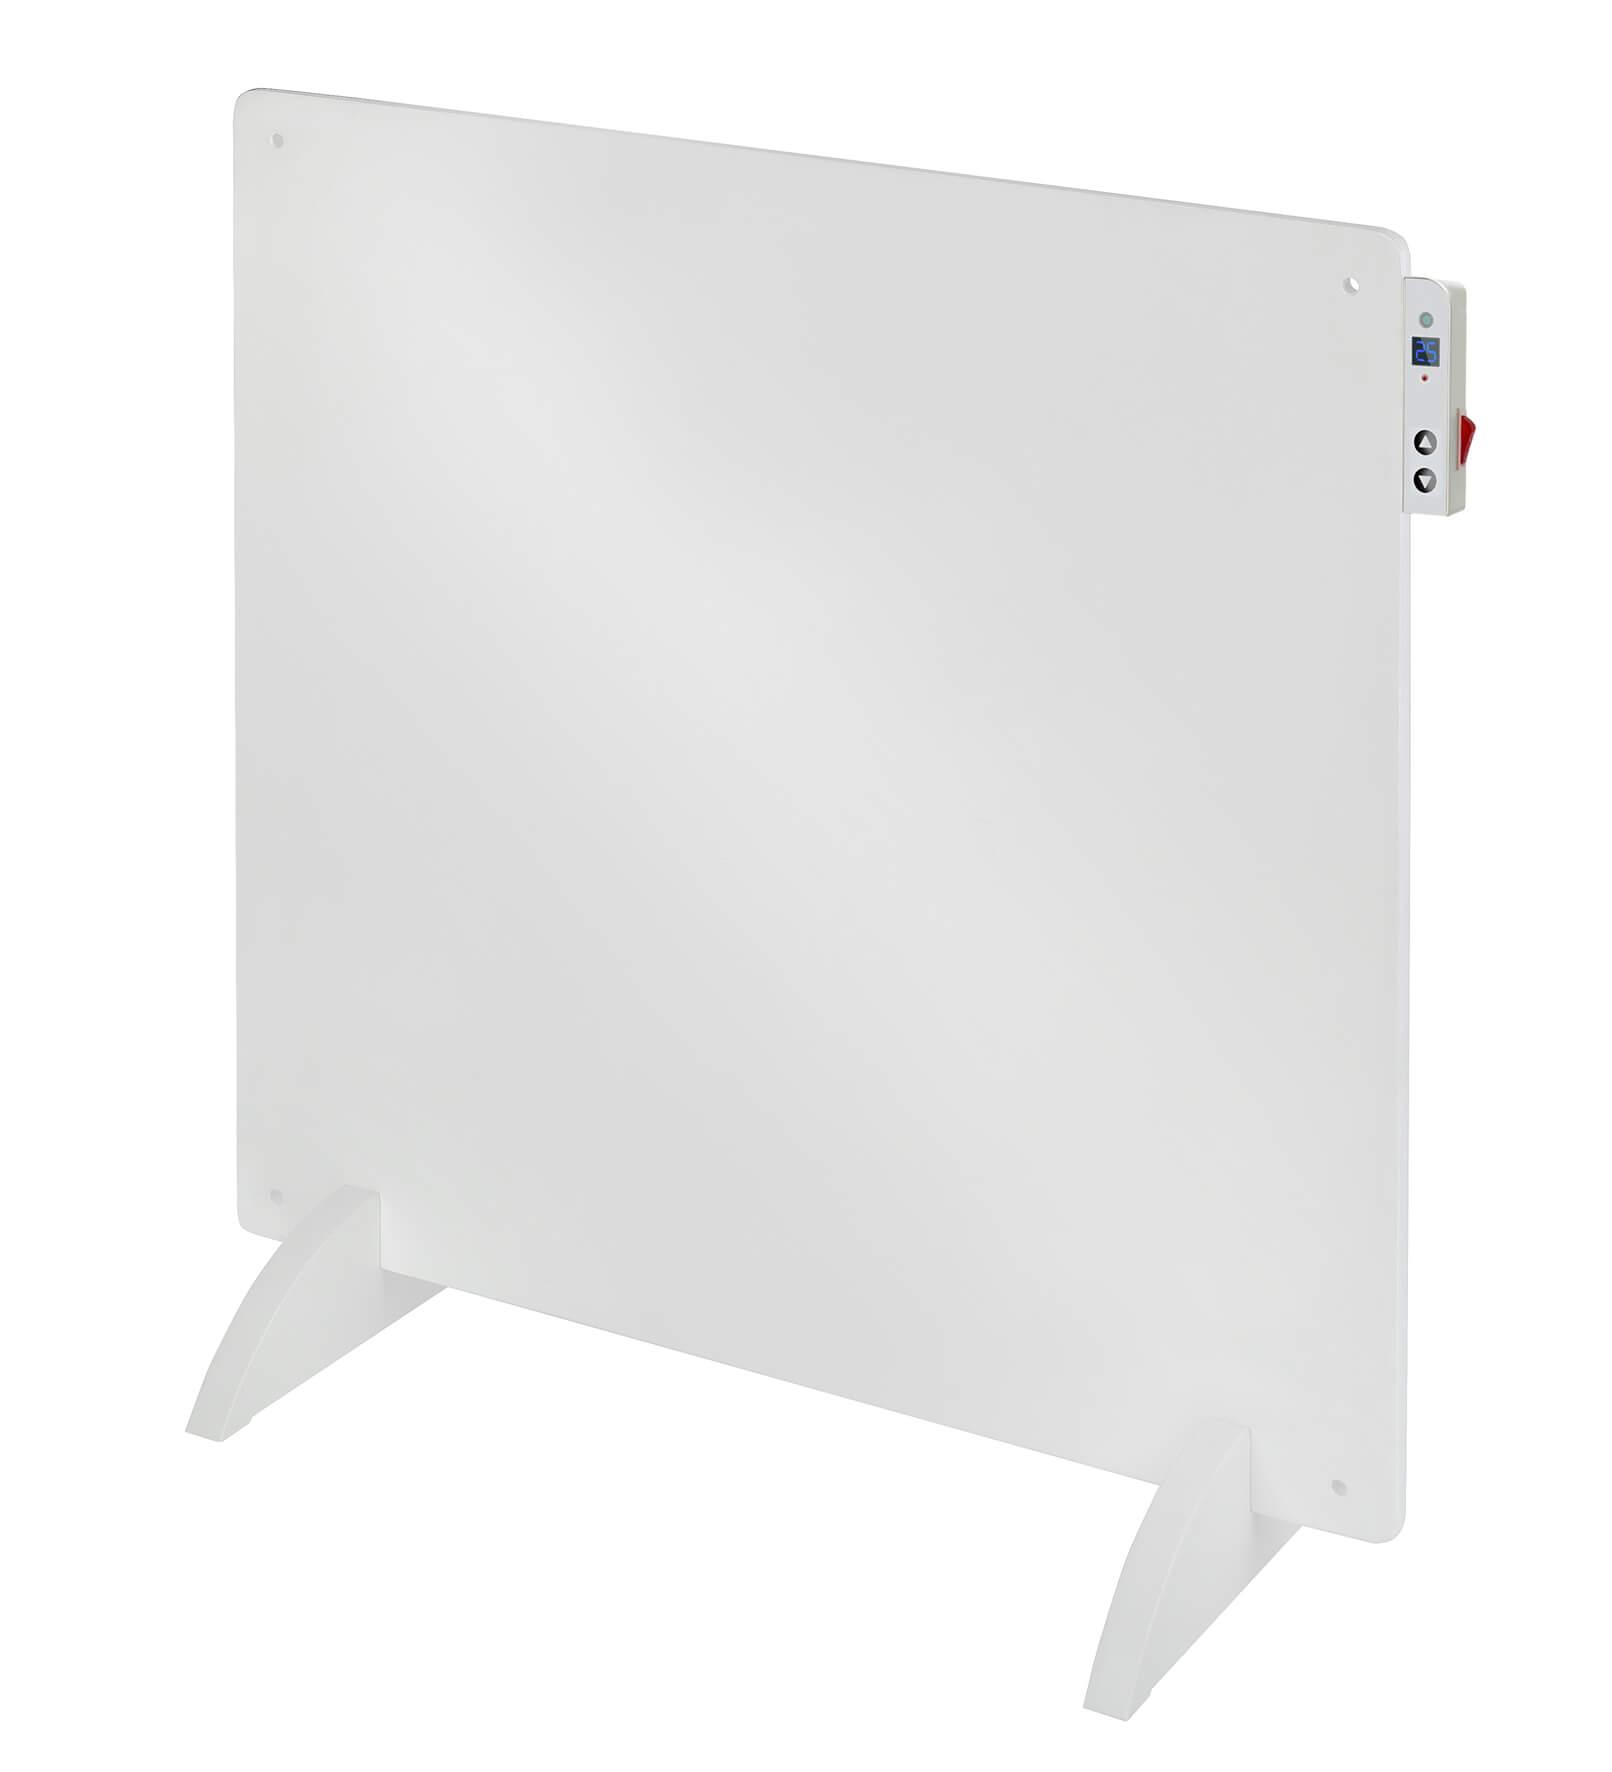 Eurom E-convect LCD In Control Elektrische verwarming 400W